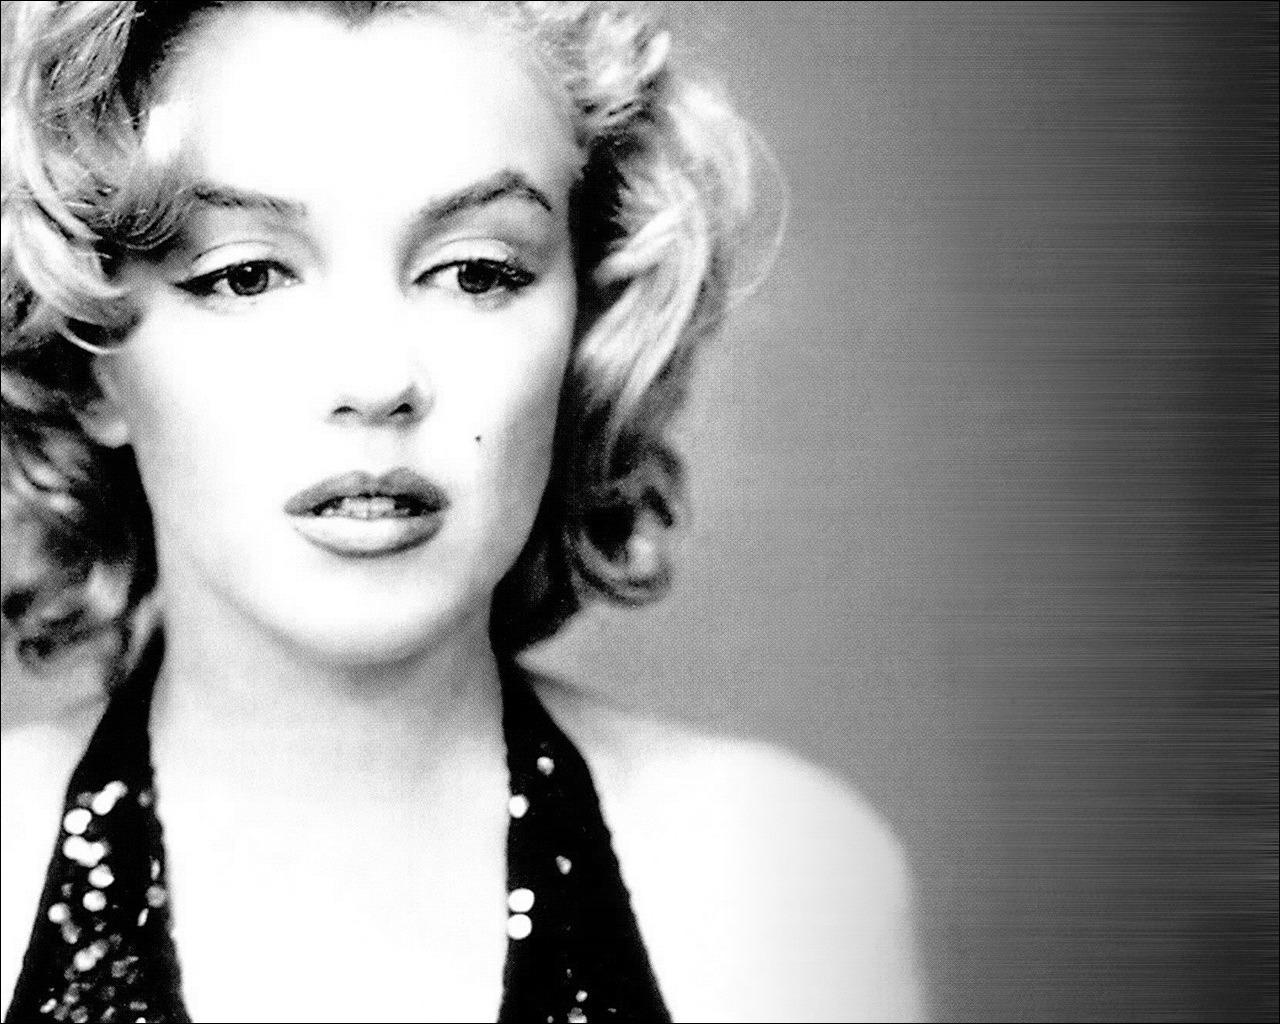 [136991-Marilyn-Monroe-Screen-Saver.jpg]